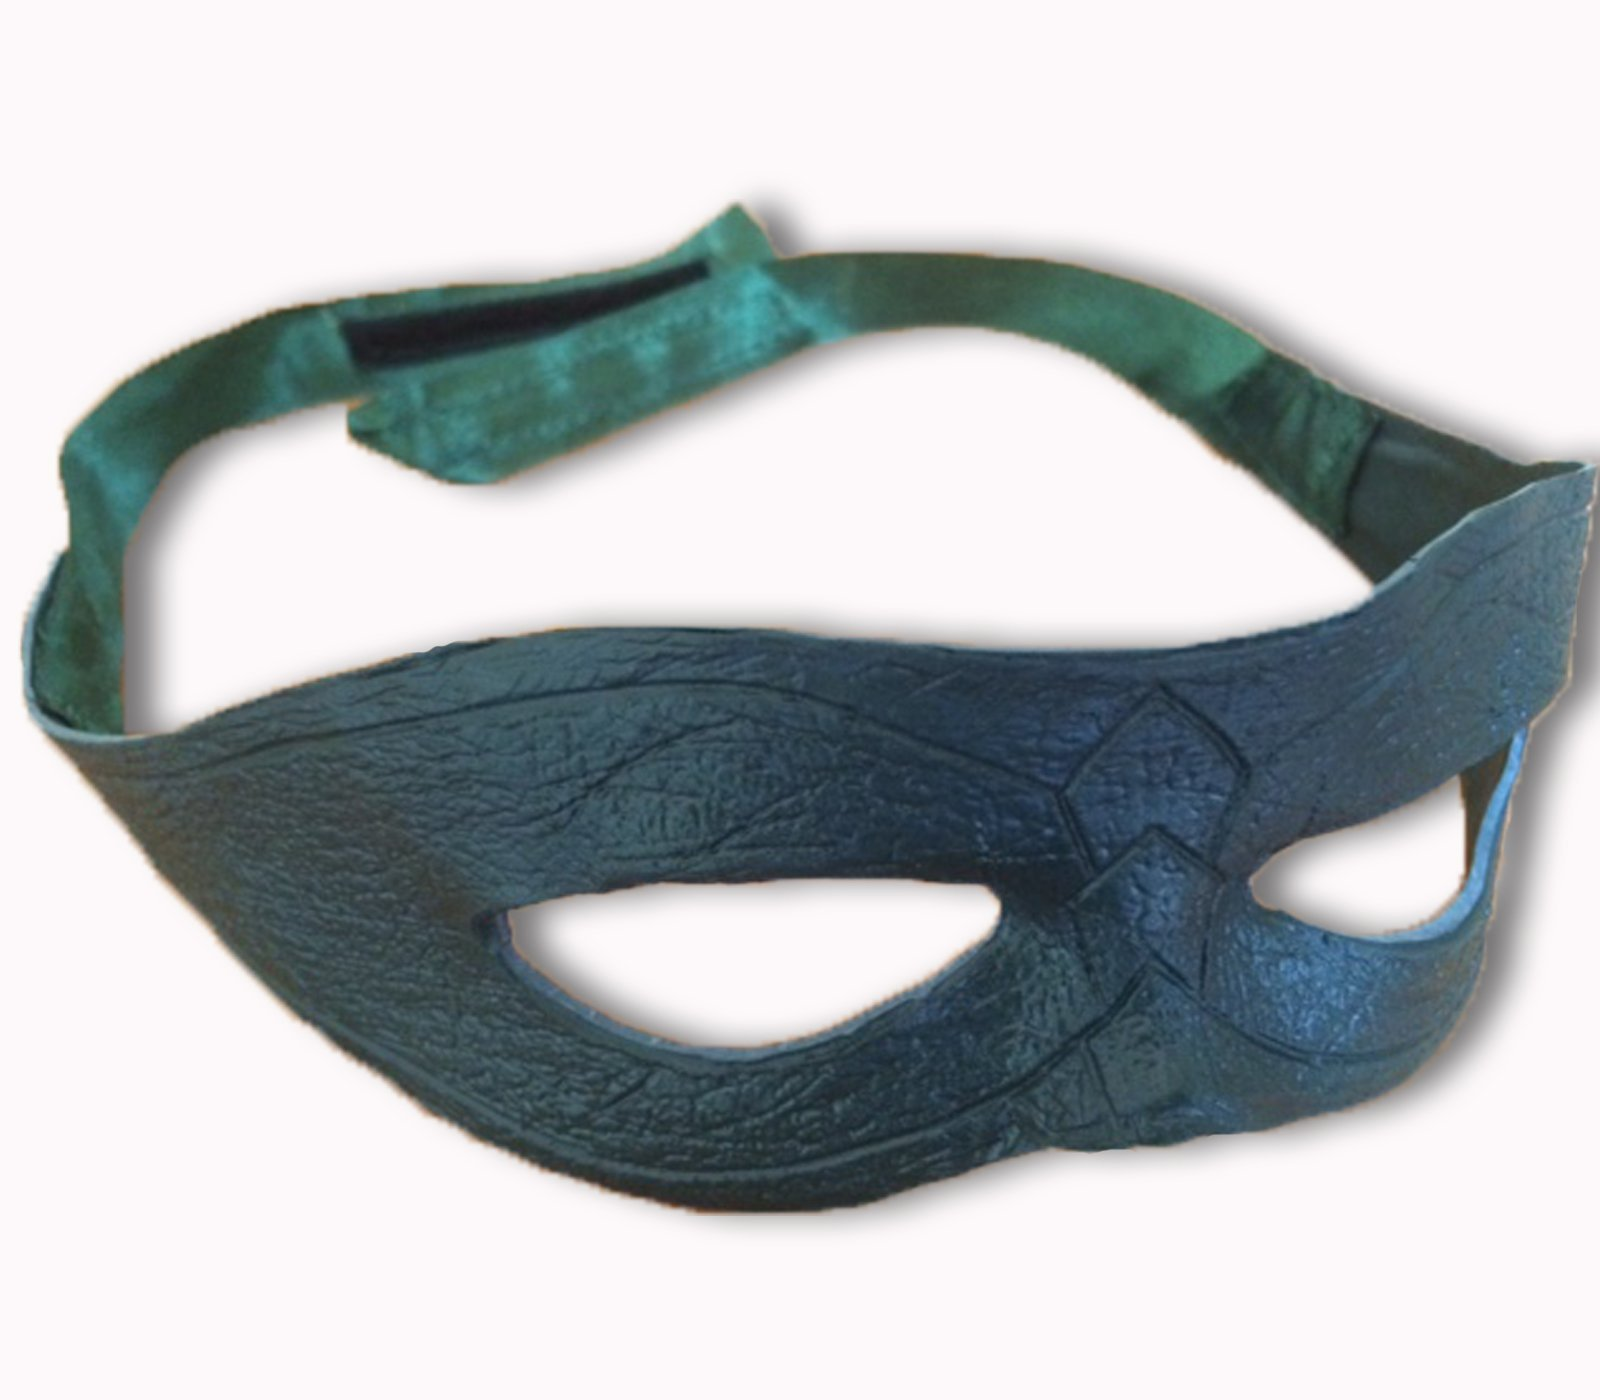 The Cosplay Company Green Arrow Eye Mask